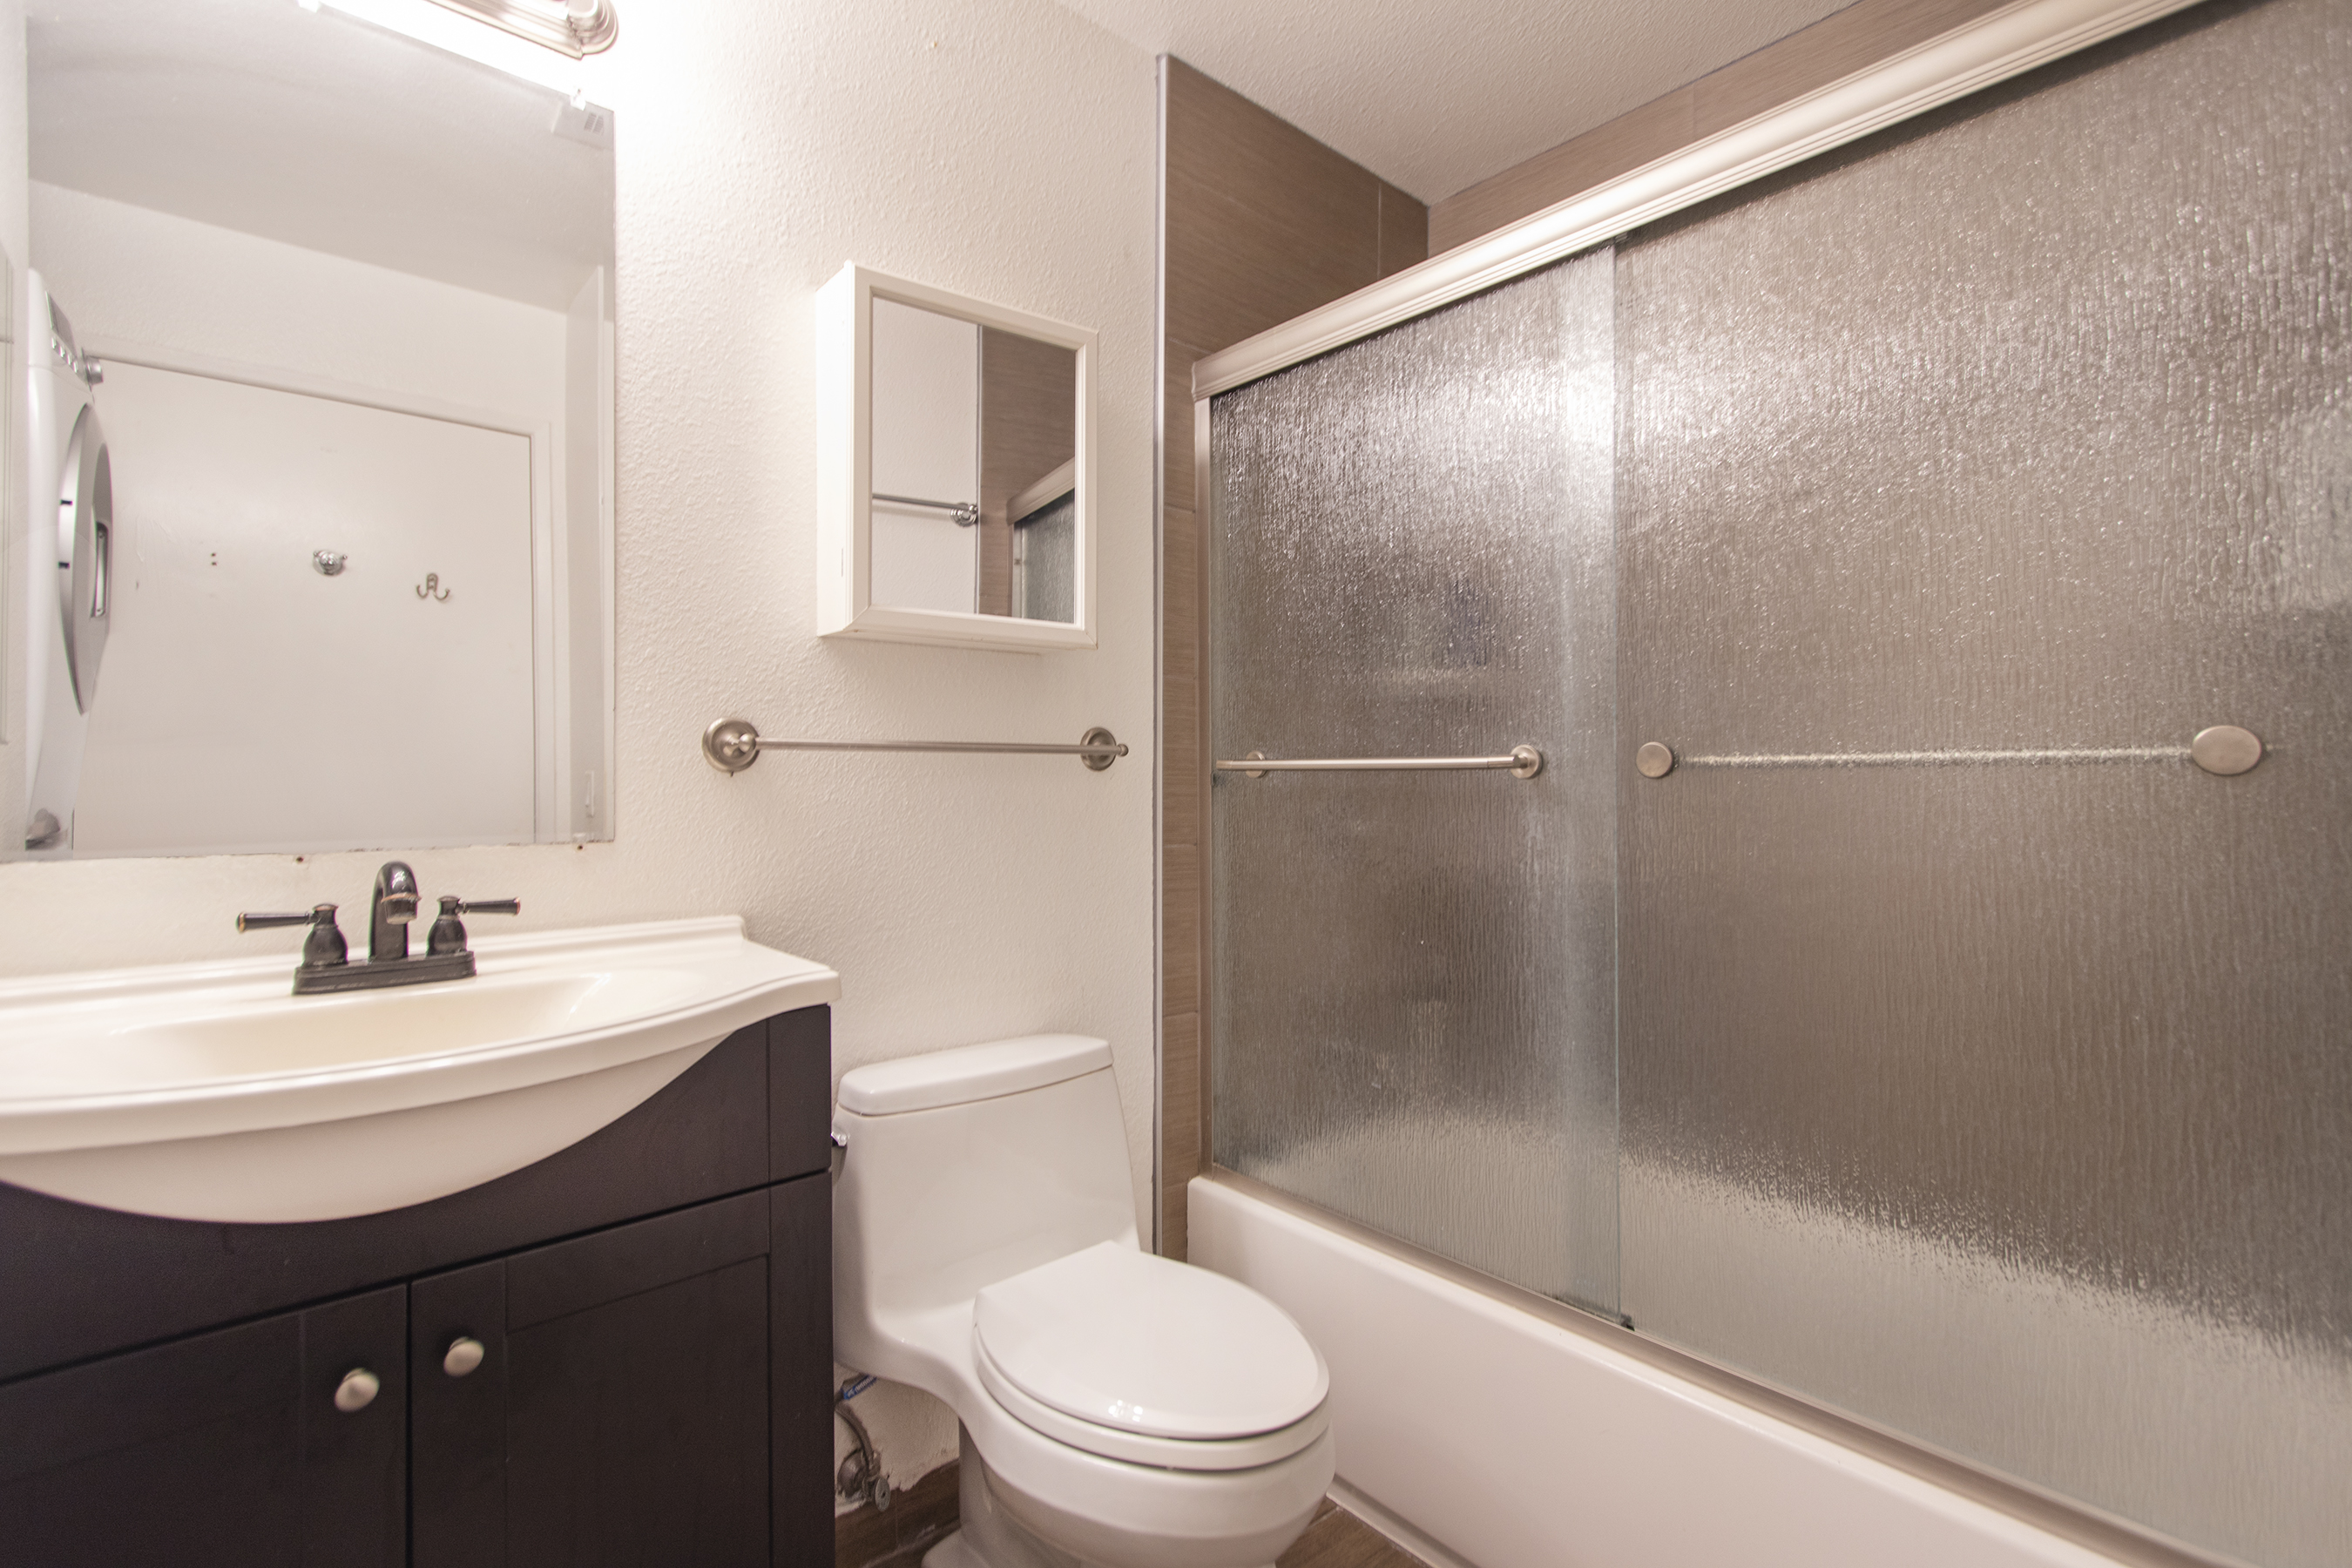 Bathroom at 94-517 Lumiaina Street Unit K205